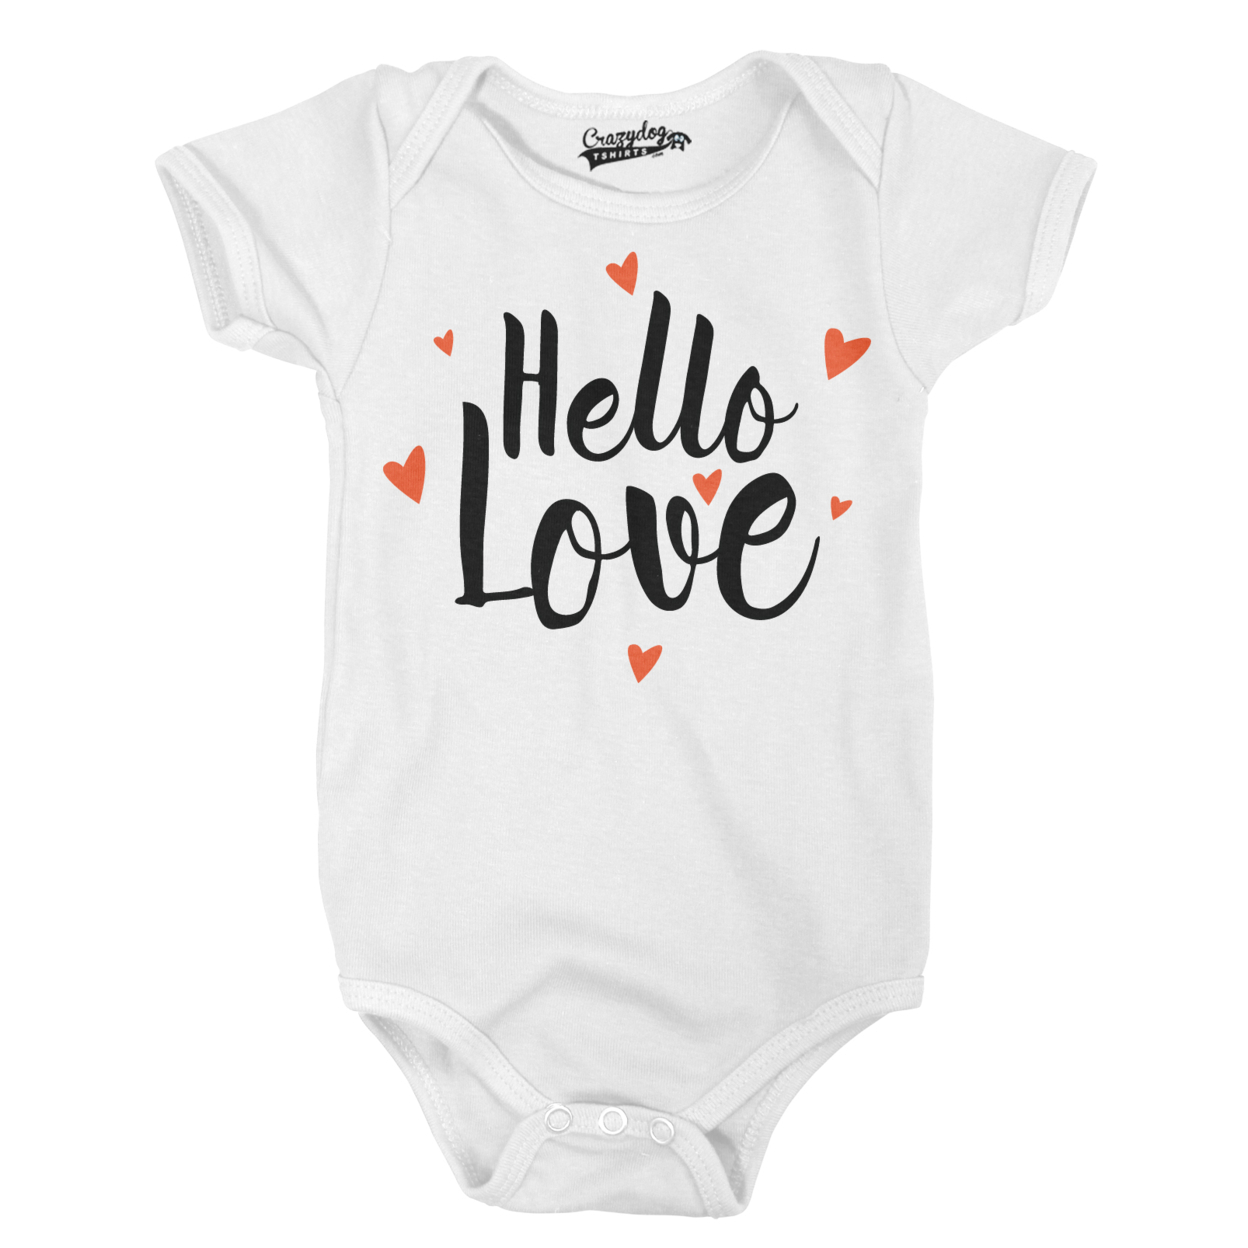 Hello Love Infant Baby Creeper 581b6de3e224616c545105d0